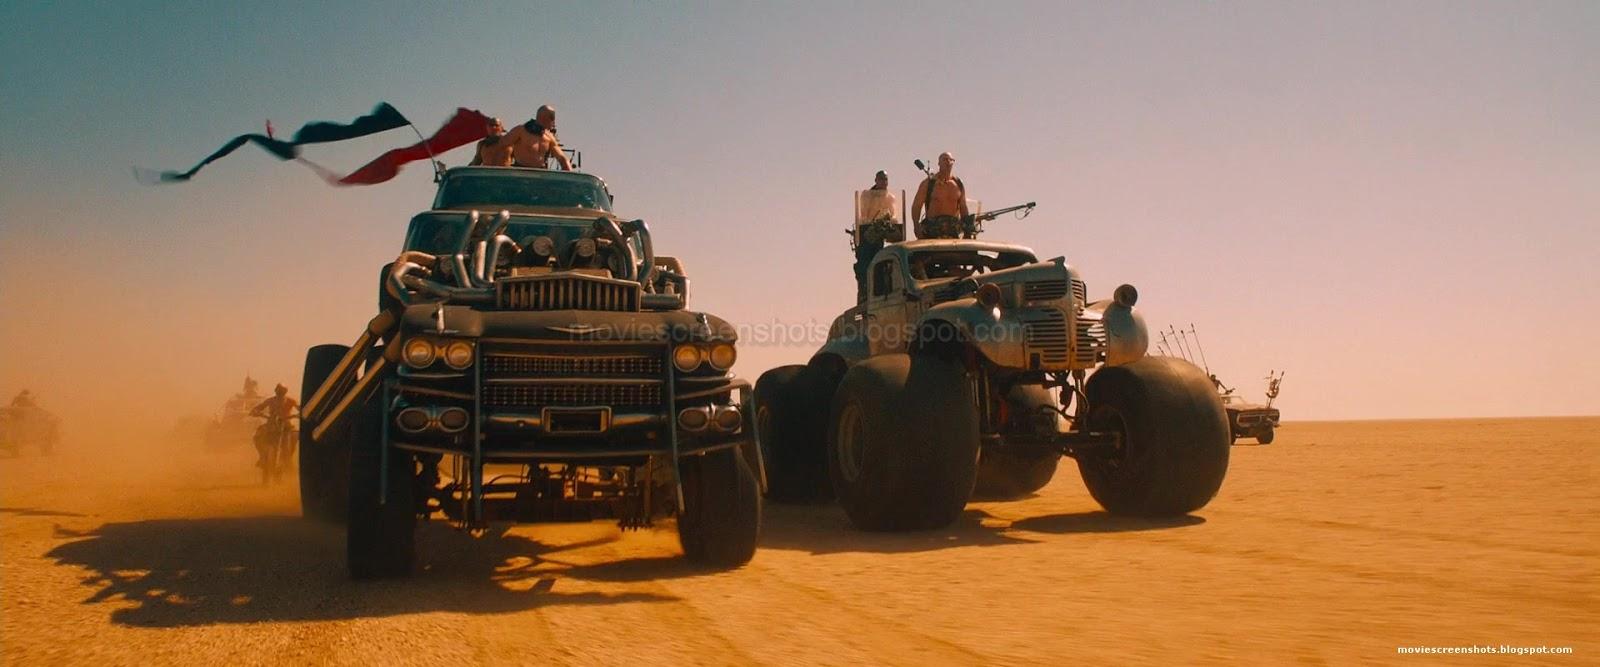 vagebonds movie screenshots mad max fury road 2015